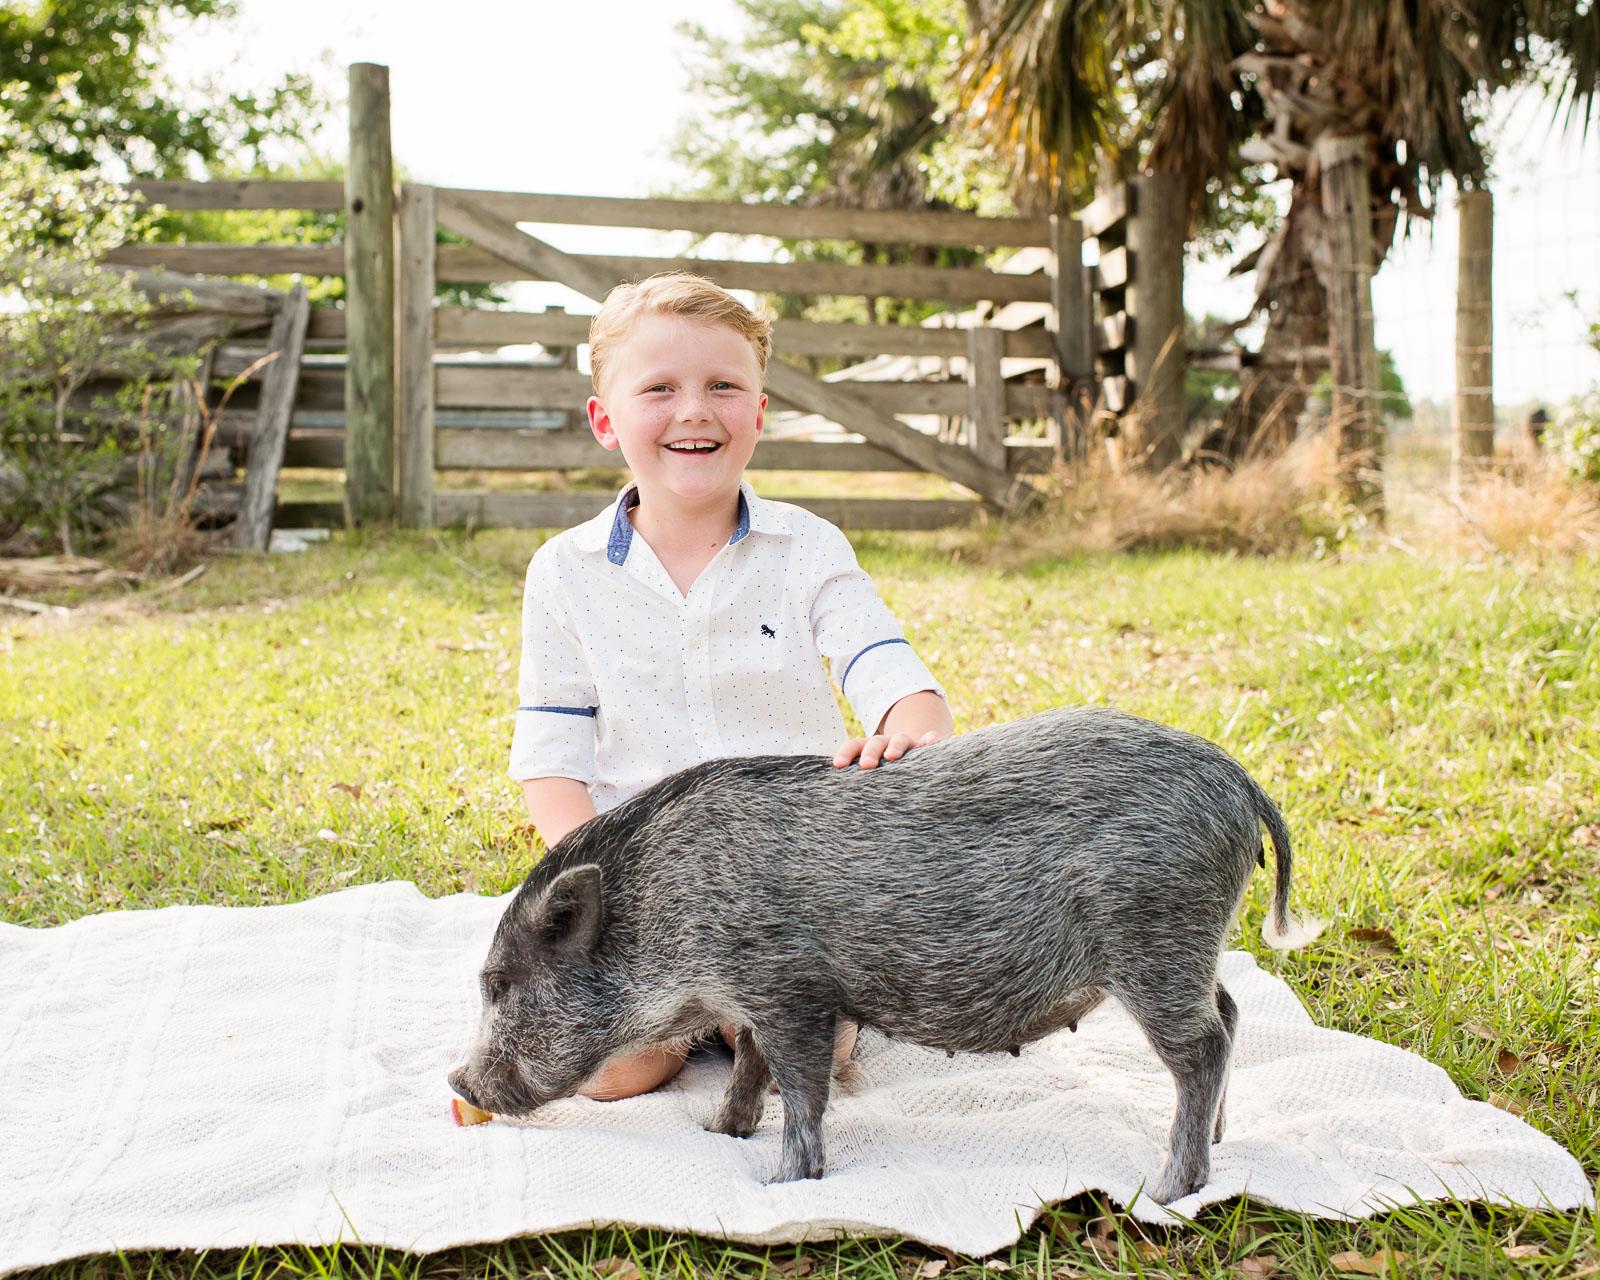 easter-photo-sessions-children-animals-01-5.jpg